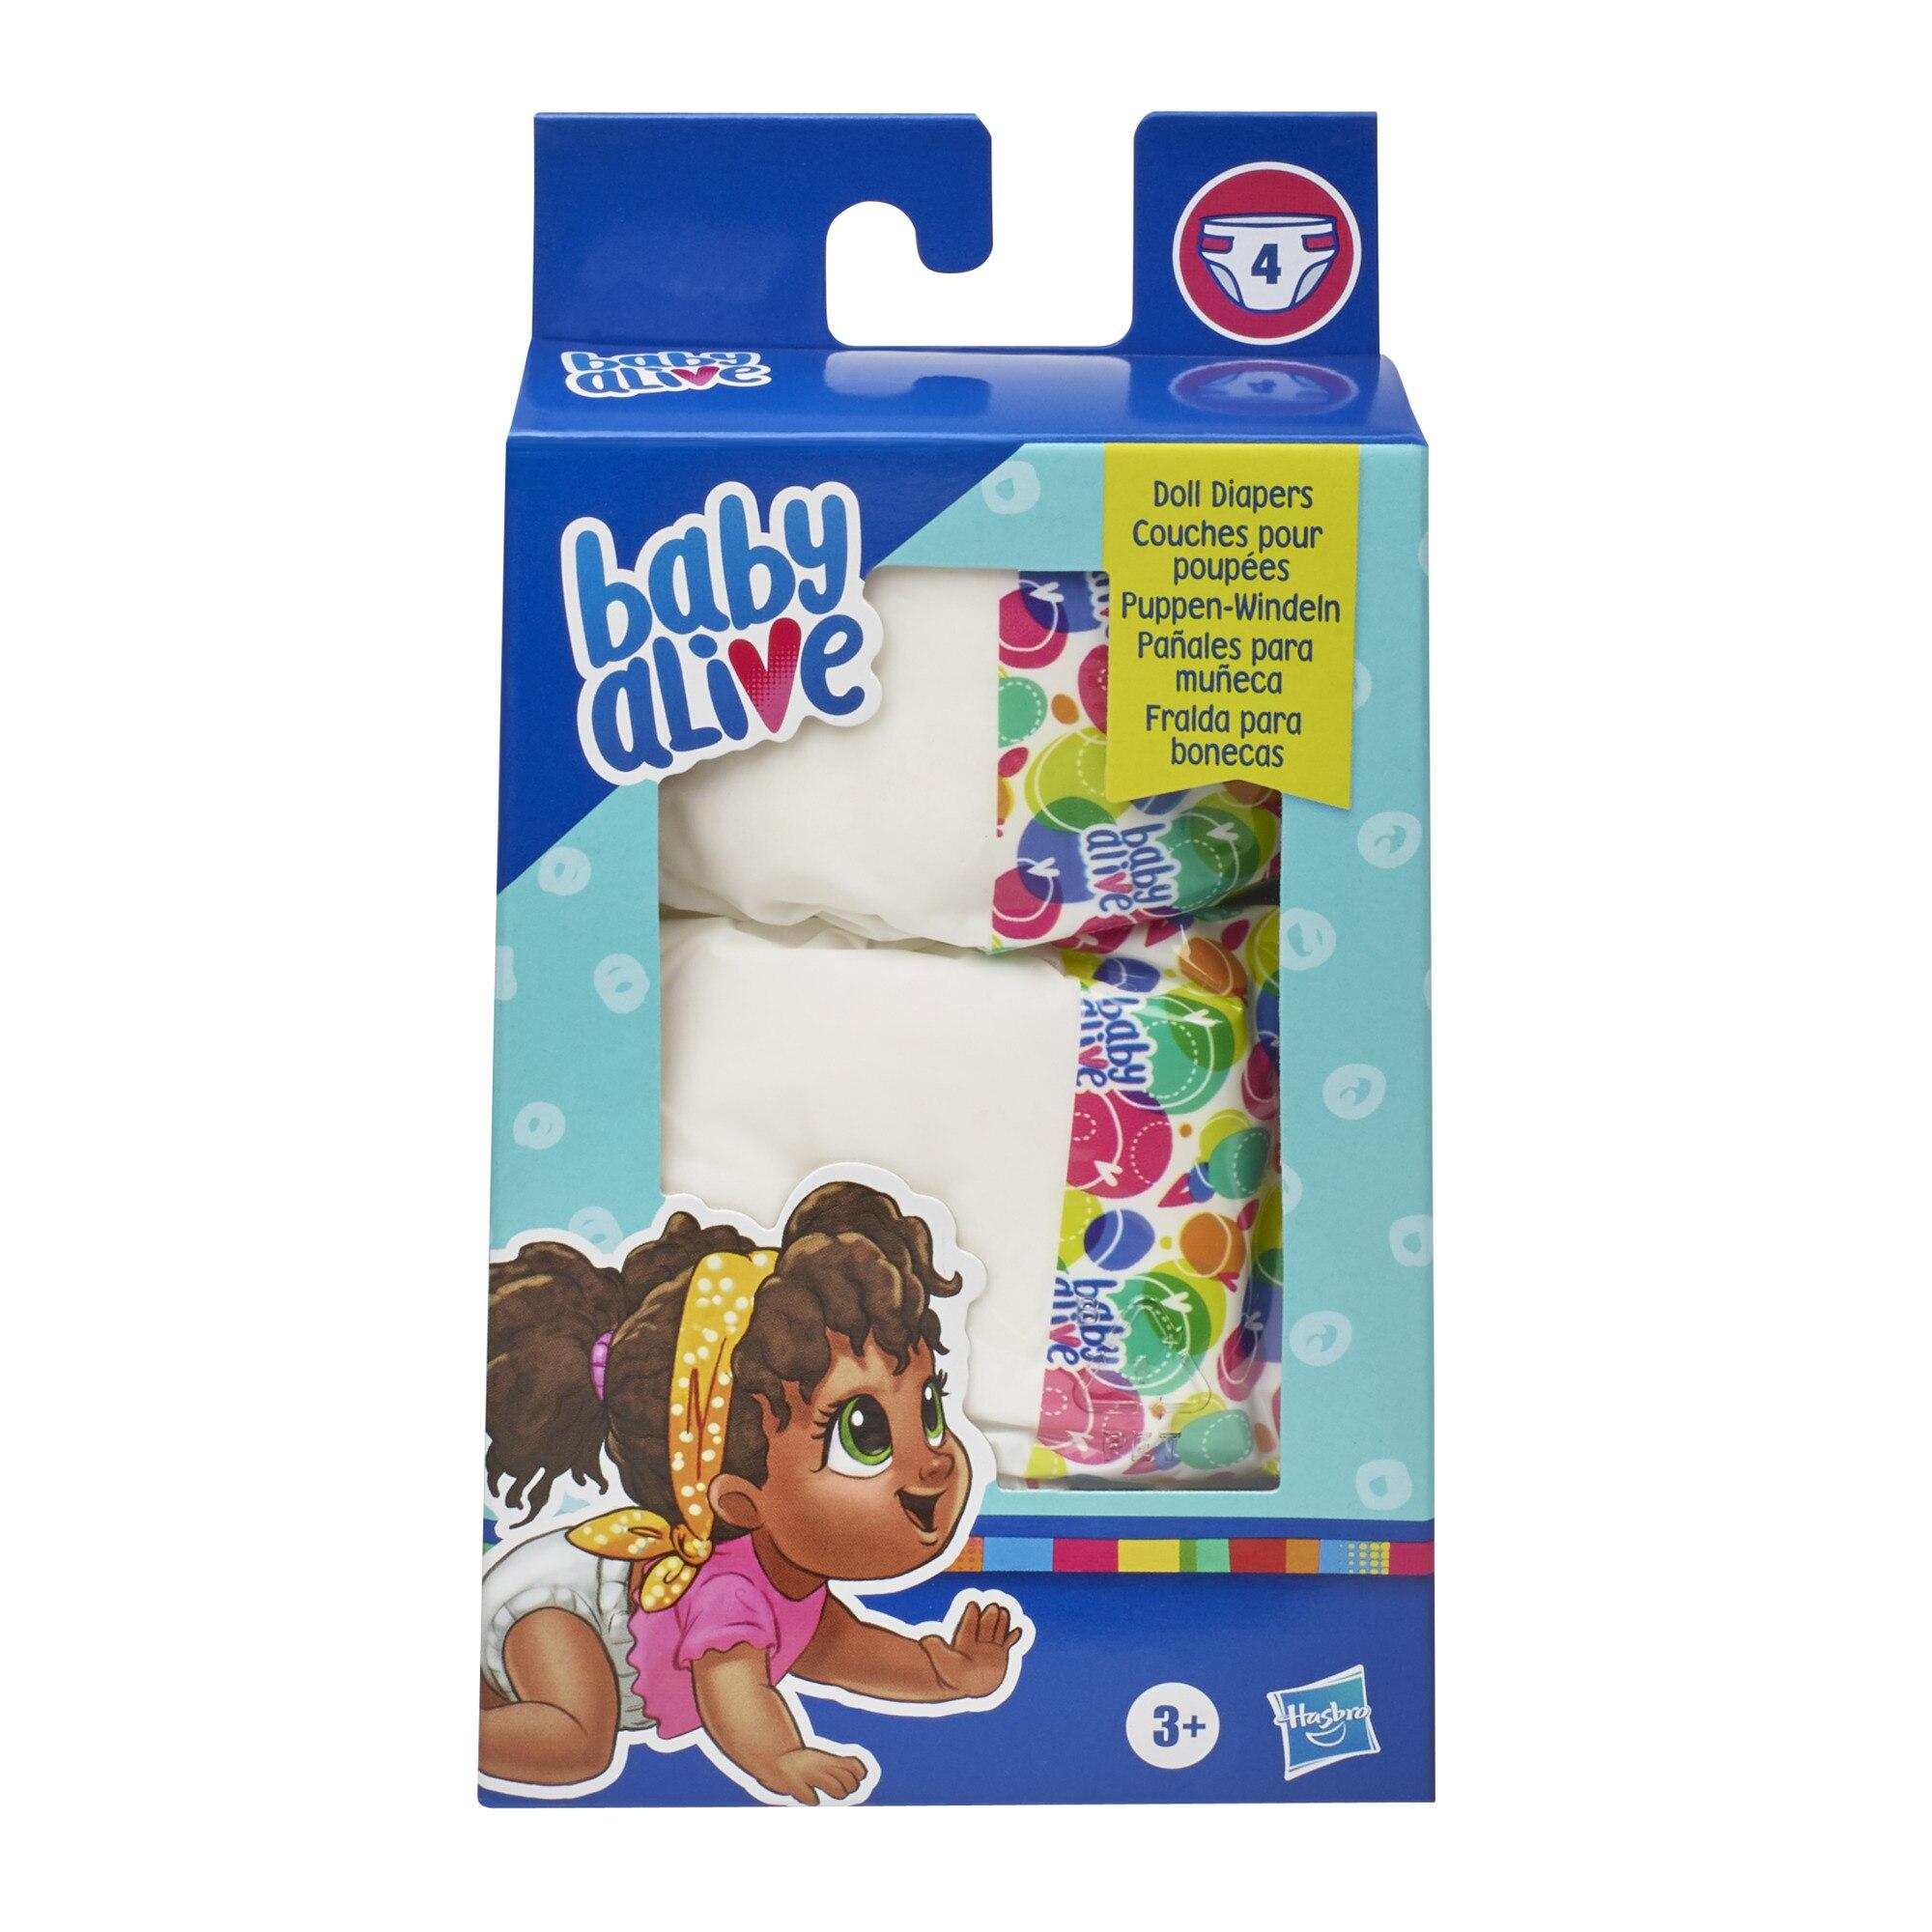 Baby Alive Diaper Refills 18 Pack